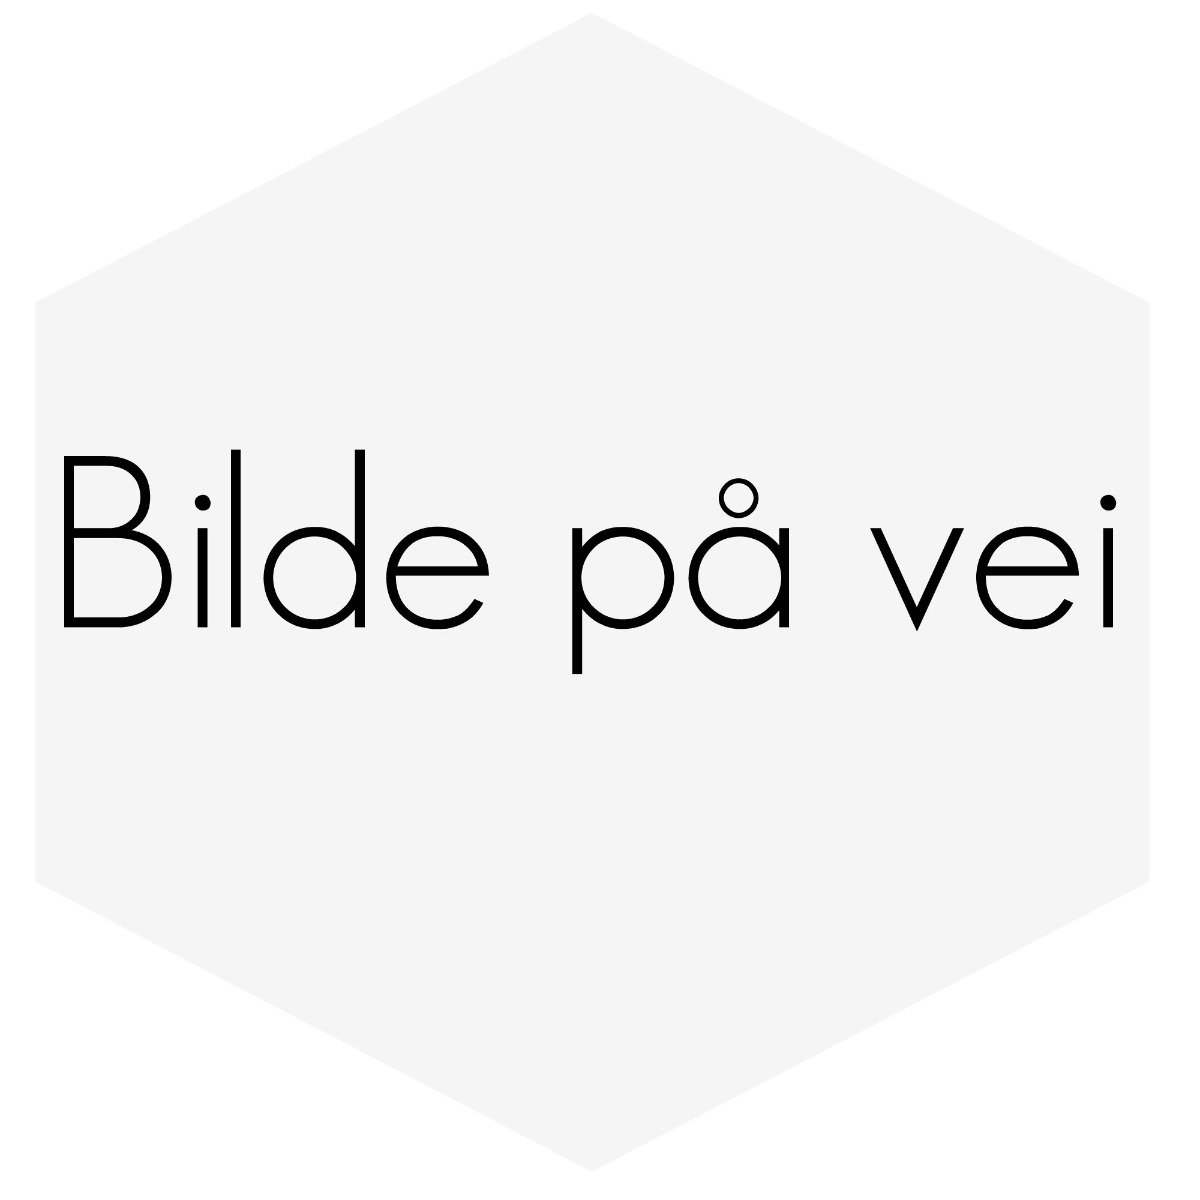 VENTILFJÆRBRIKKE TIL DOBBLE FJÆRER TYP SVF1317